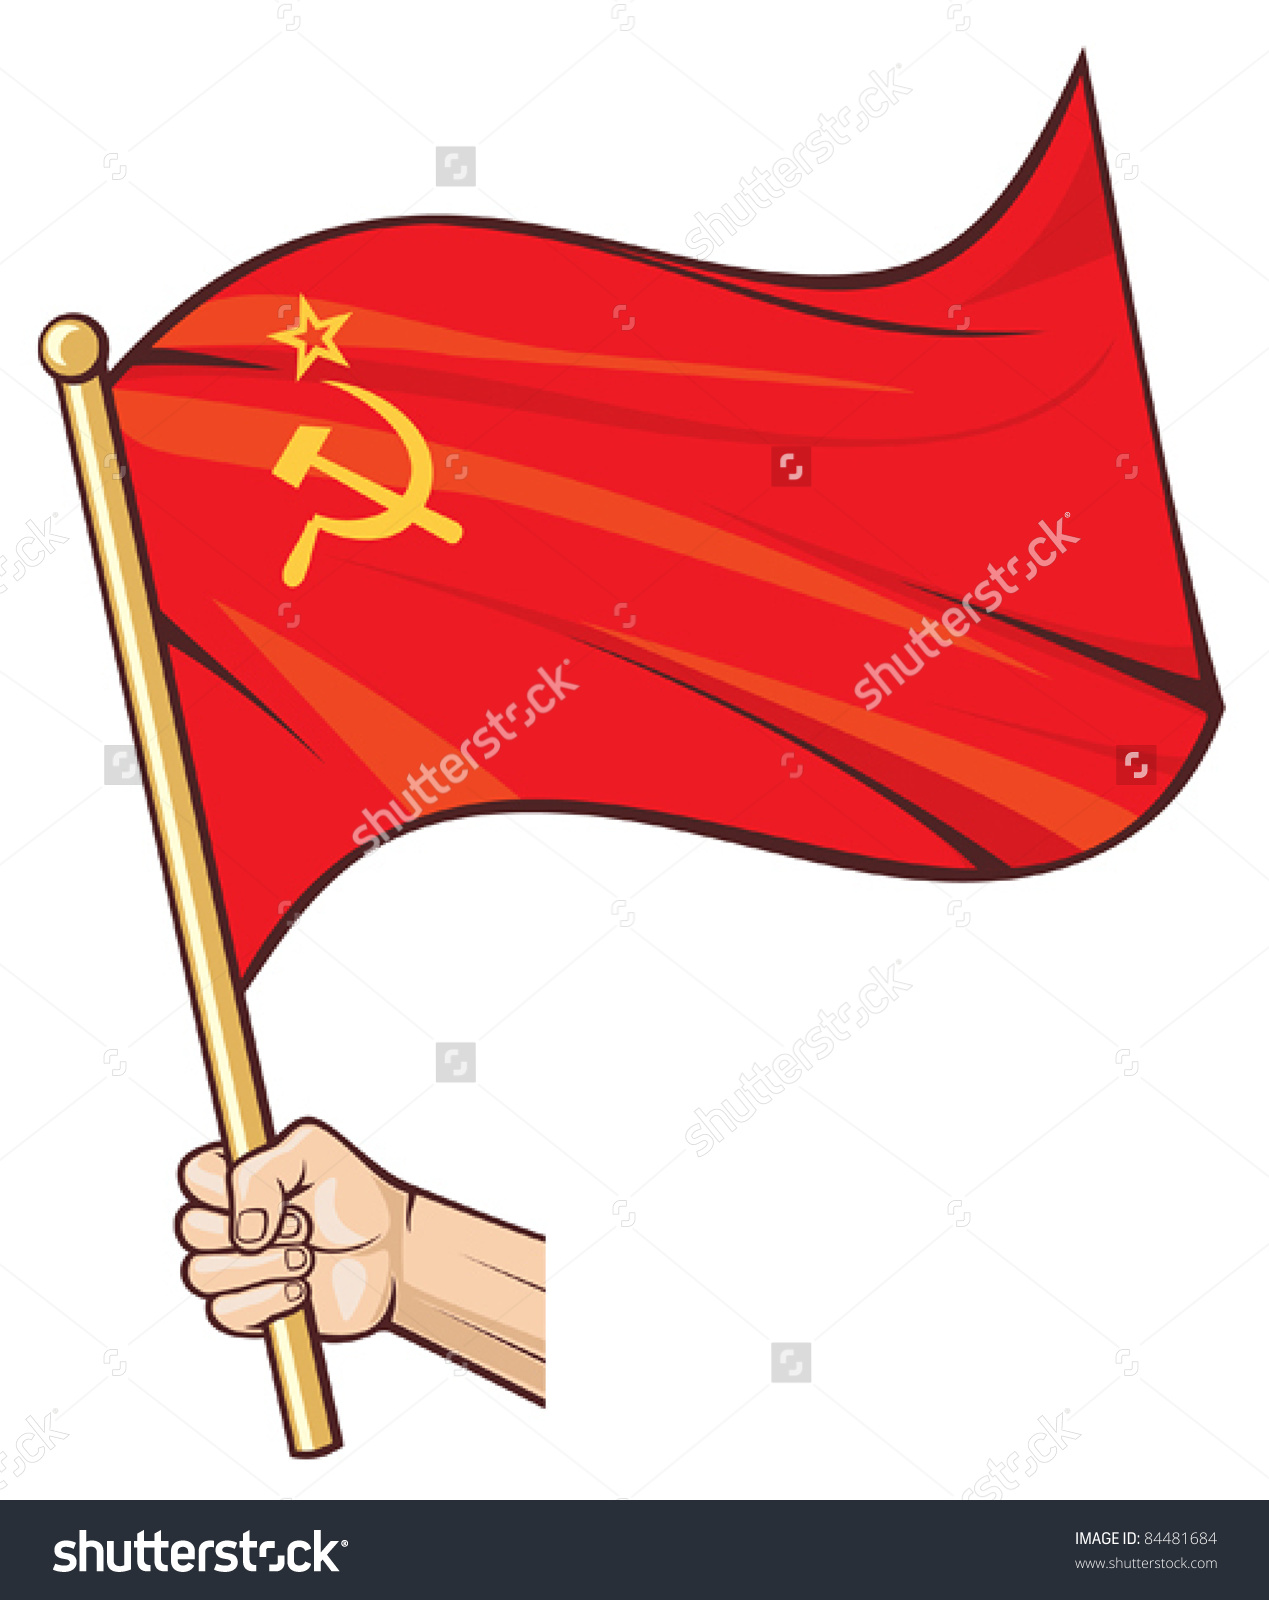 Russia clipart Soviet Union Clipart #2